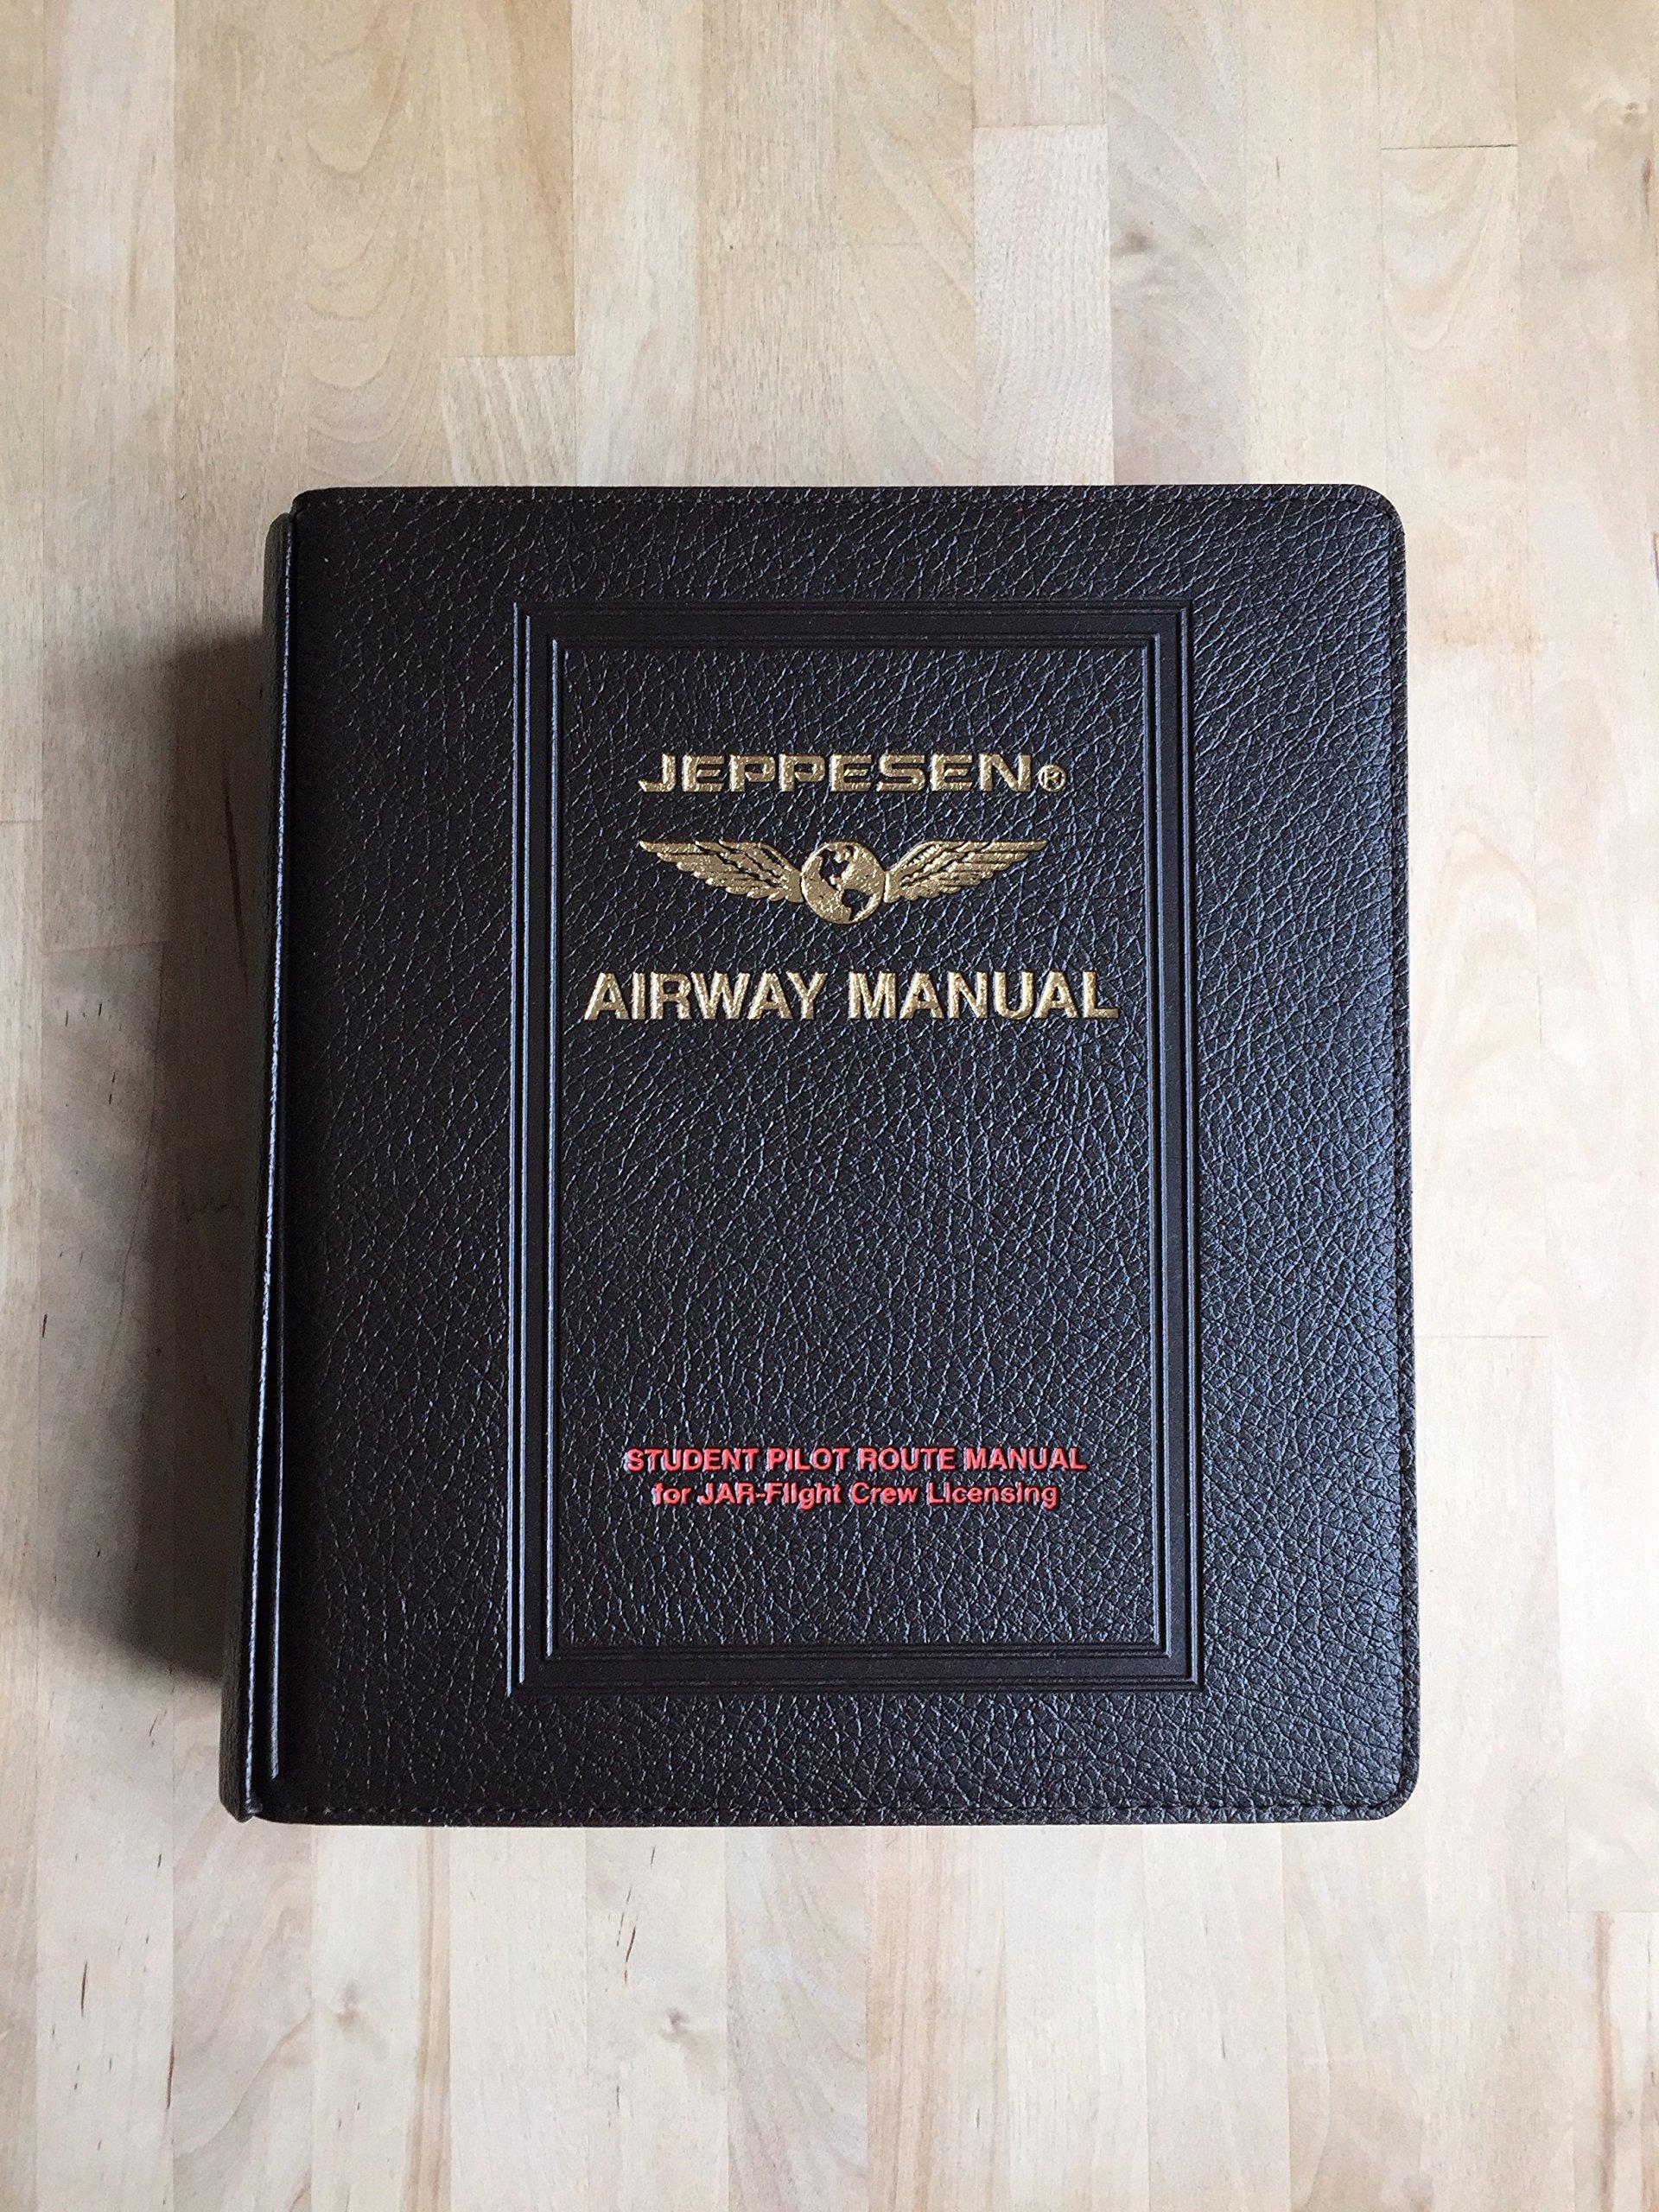 Jeppesen Airway Manual: Student Pilot Route Manual for JAR-Flight Crew  Licensing (Jeppesen Airway Manual Services): Amazon.co.uk: Jeppesen  Sanderson: Books